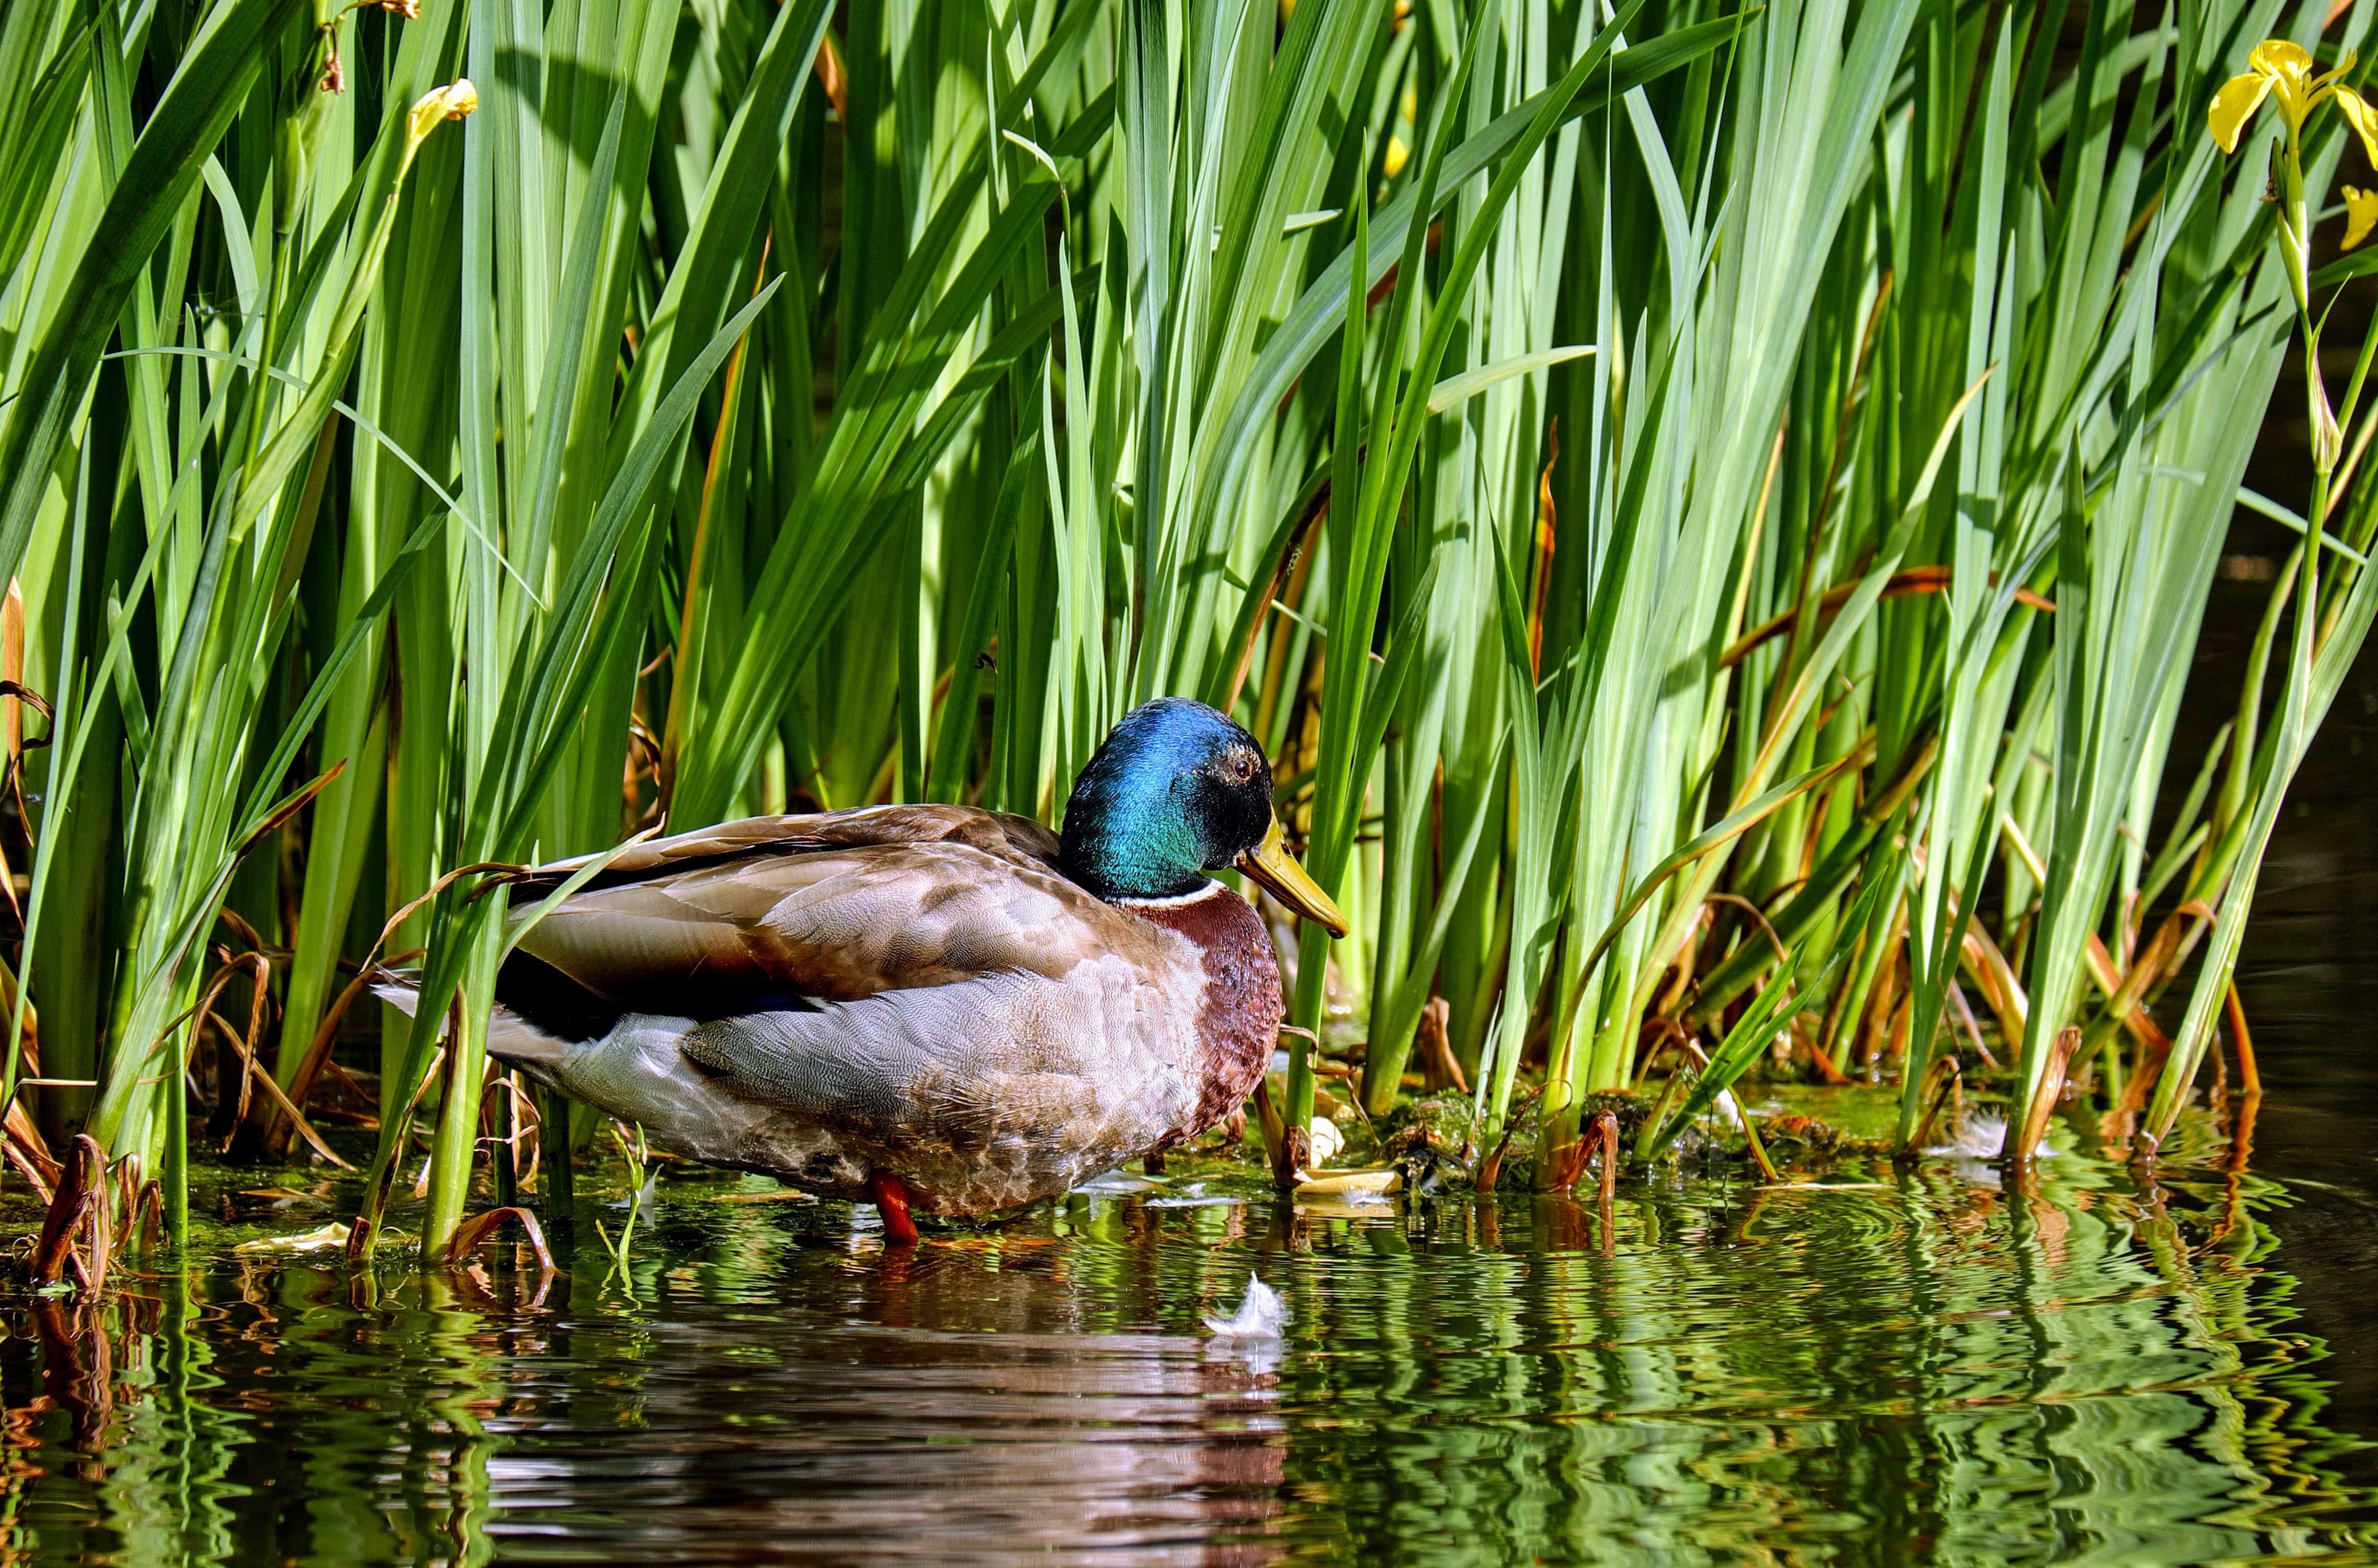 Pond Wallpaper Hd Free Picture Bird Nature Mallard Grass Duck Lake